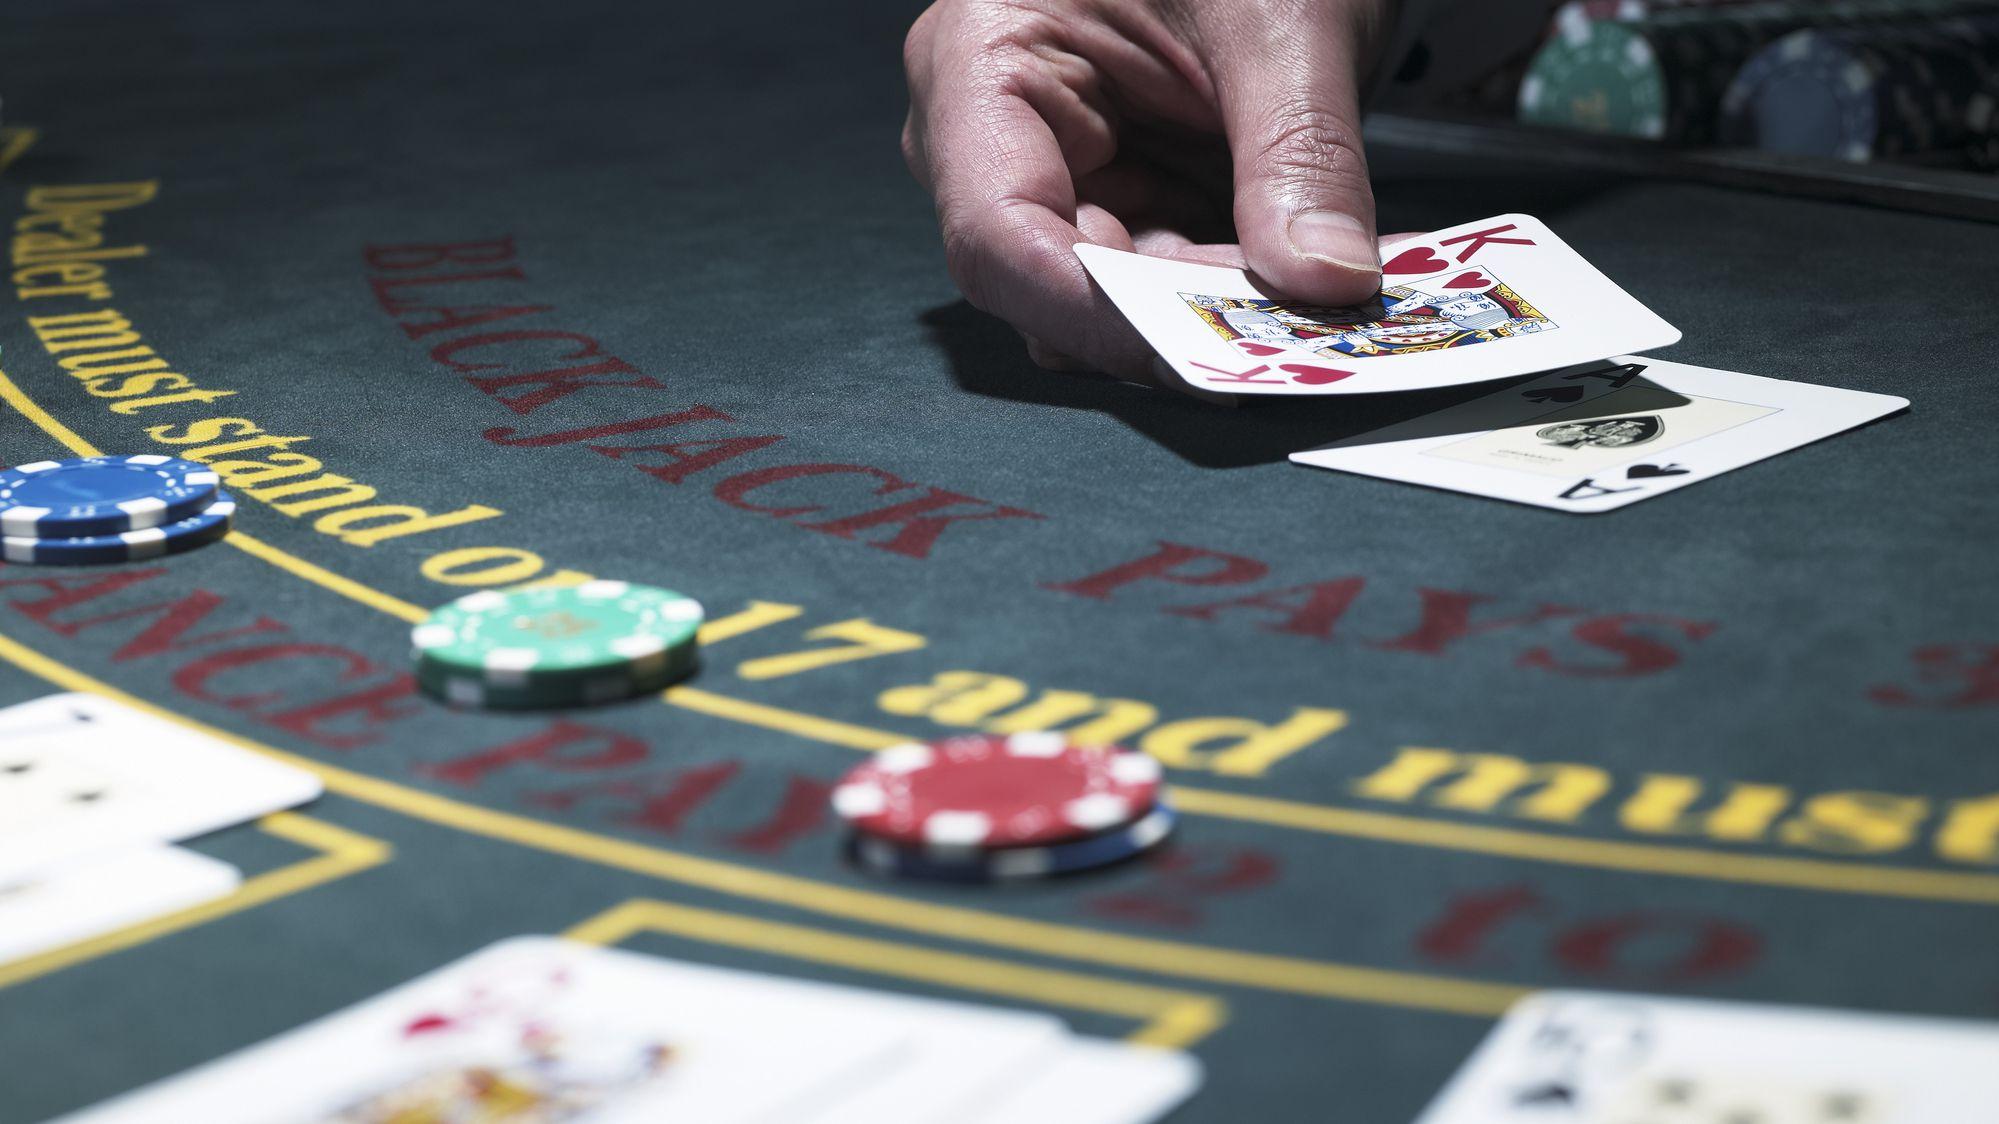 World cup betting odds ladbrokes poker online betting voucher codes